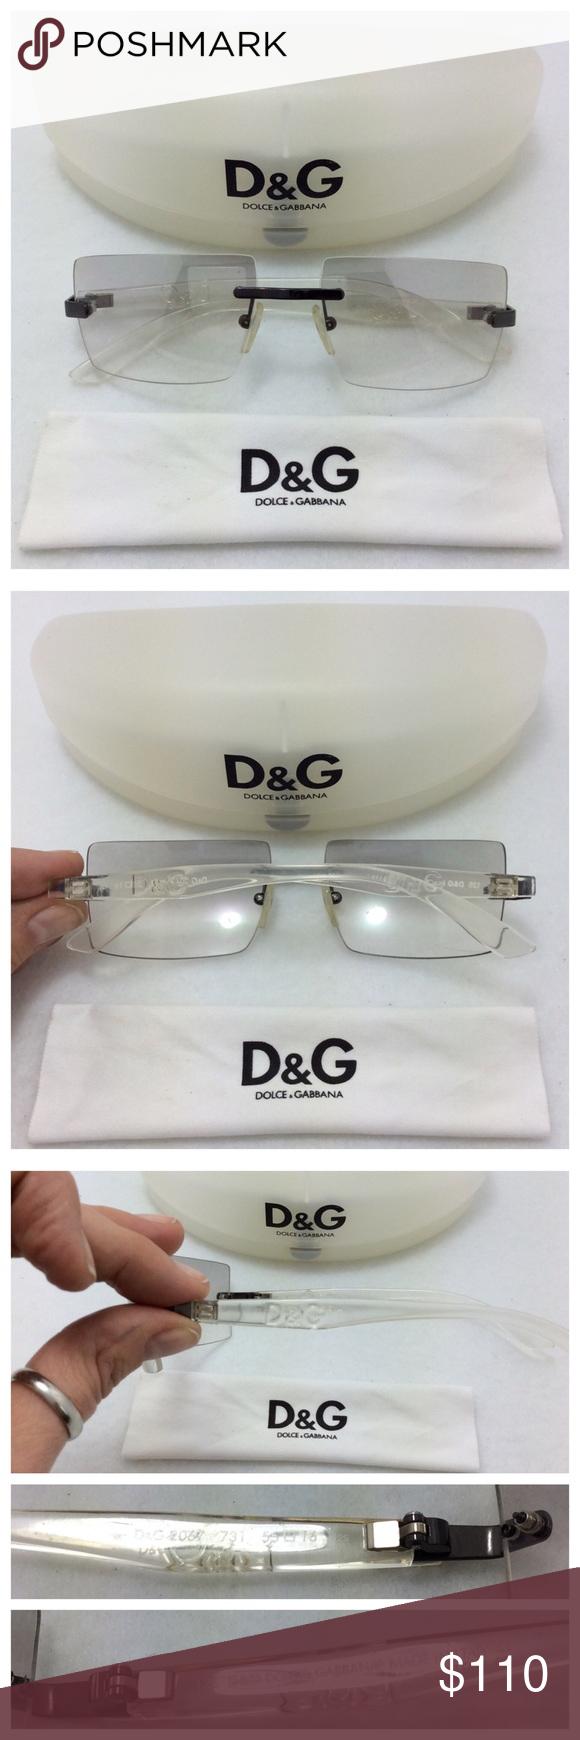 057efc559623 Dolce & Gabbana Sunglasses D&G 2067. Rare Rimless Sunglasses with clear  rectangular lenses, slight